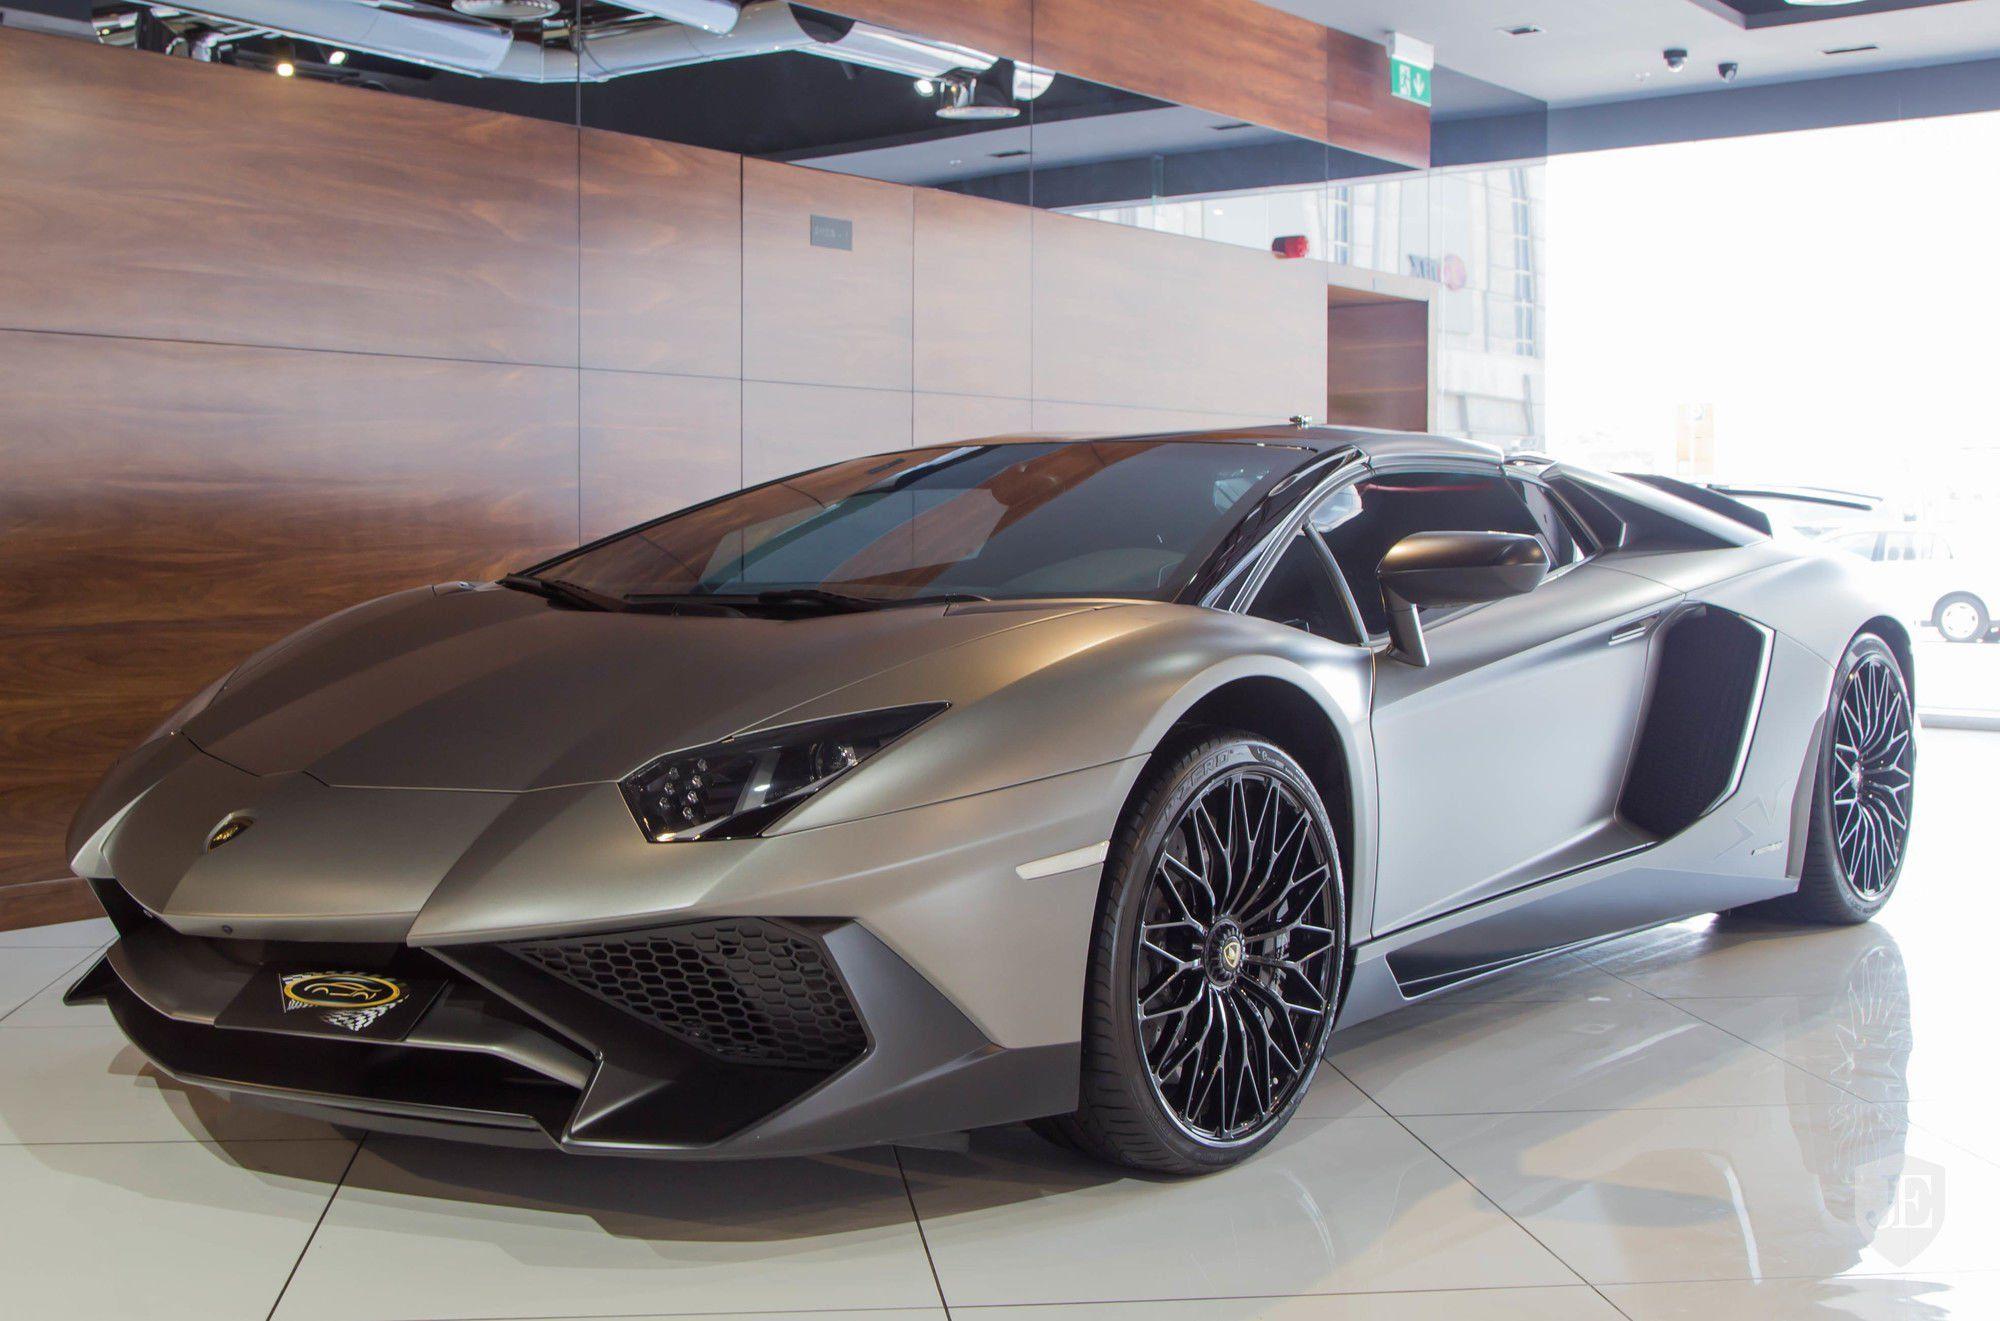 Lamborghini Aventador 2017 For Sale At Carolbly Com Exotic Cars